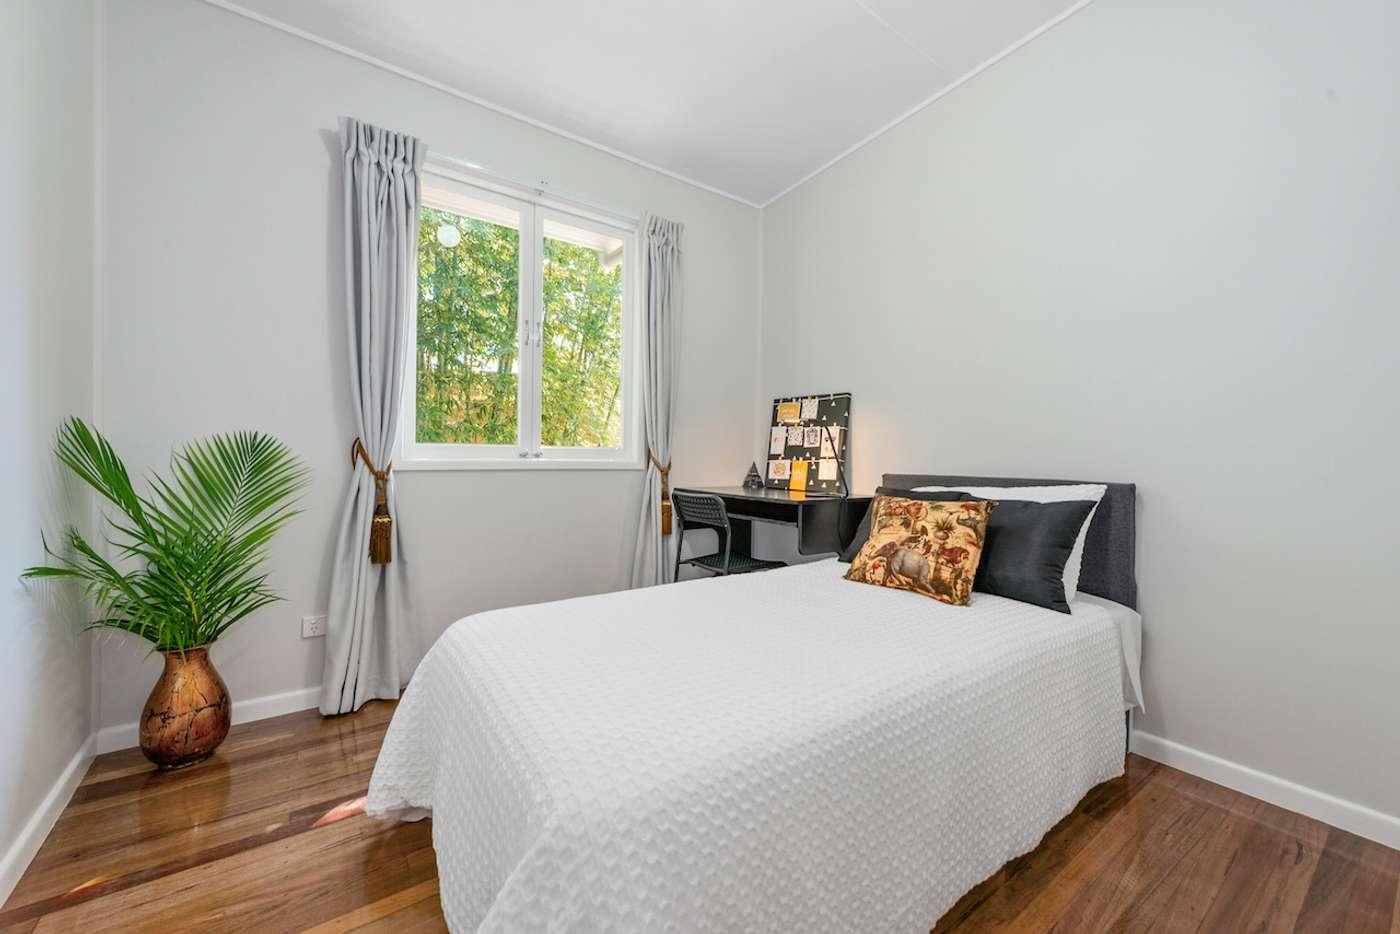 Sixth view of Homely house listing, 31 Suncroft Street, Mount Gravatt QLD 4122